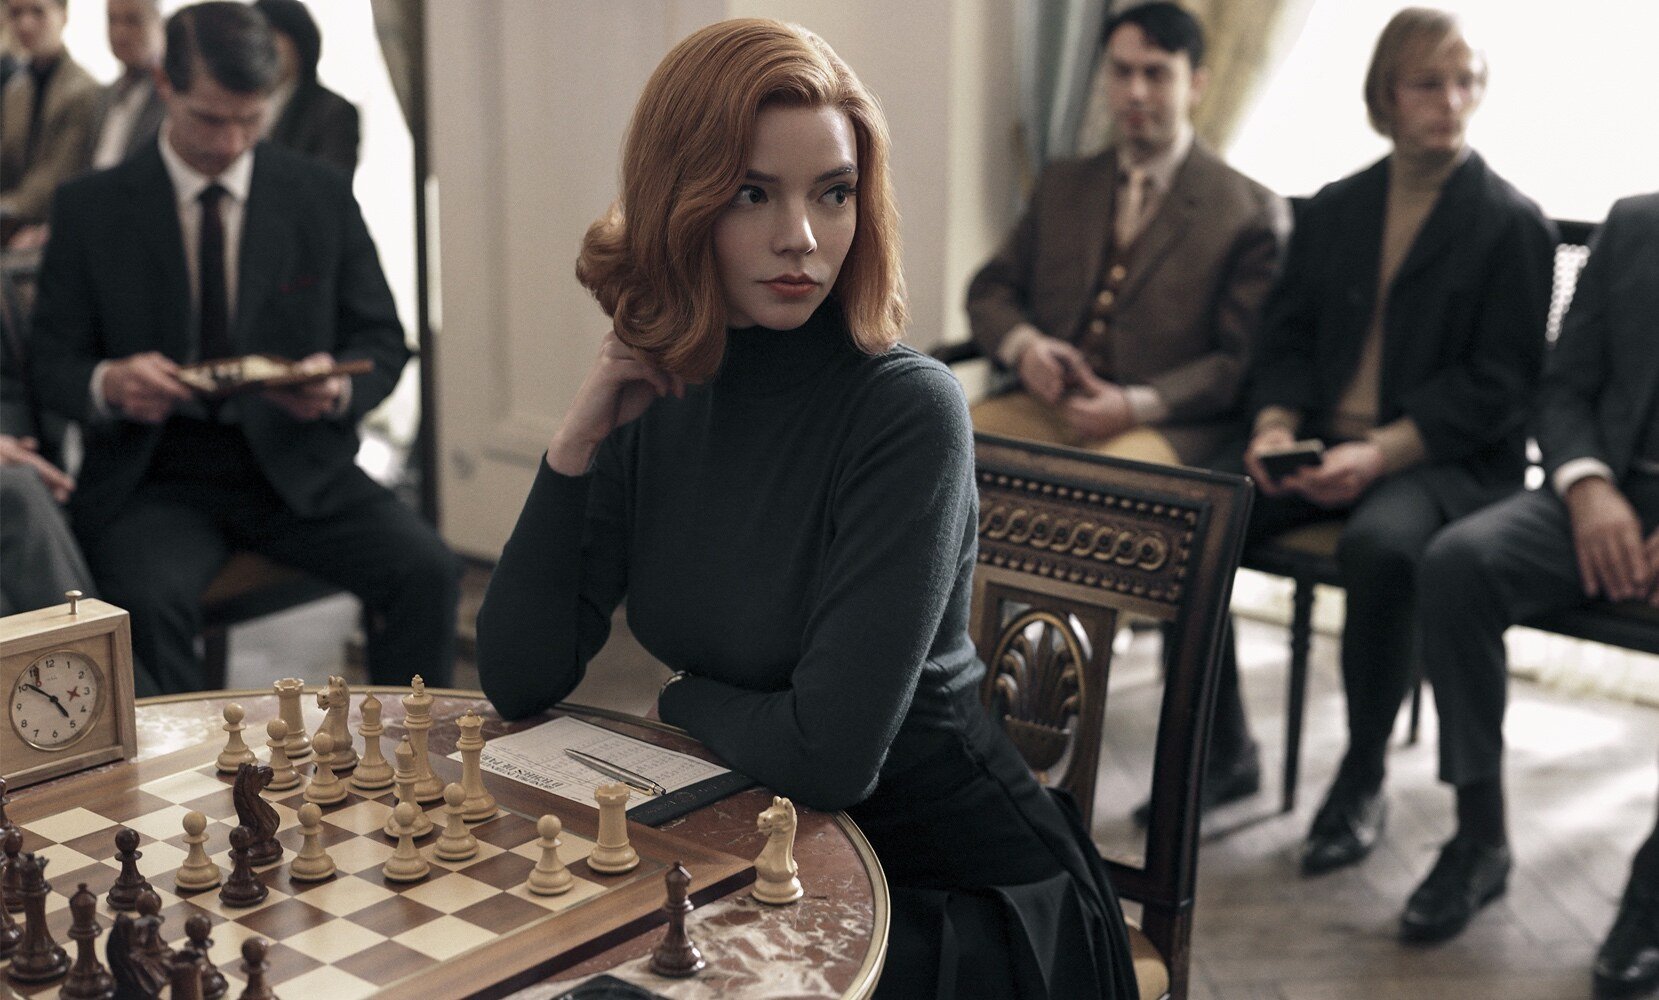 La regina degli scacchi - Queen's Gambit